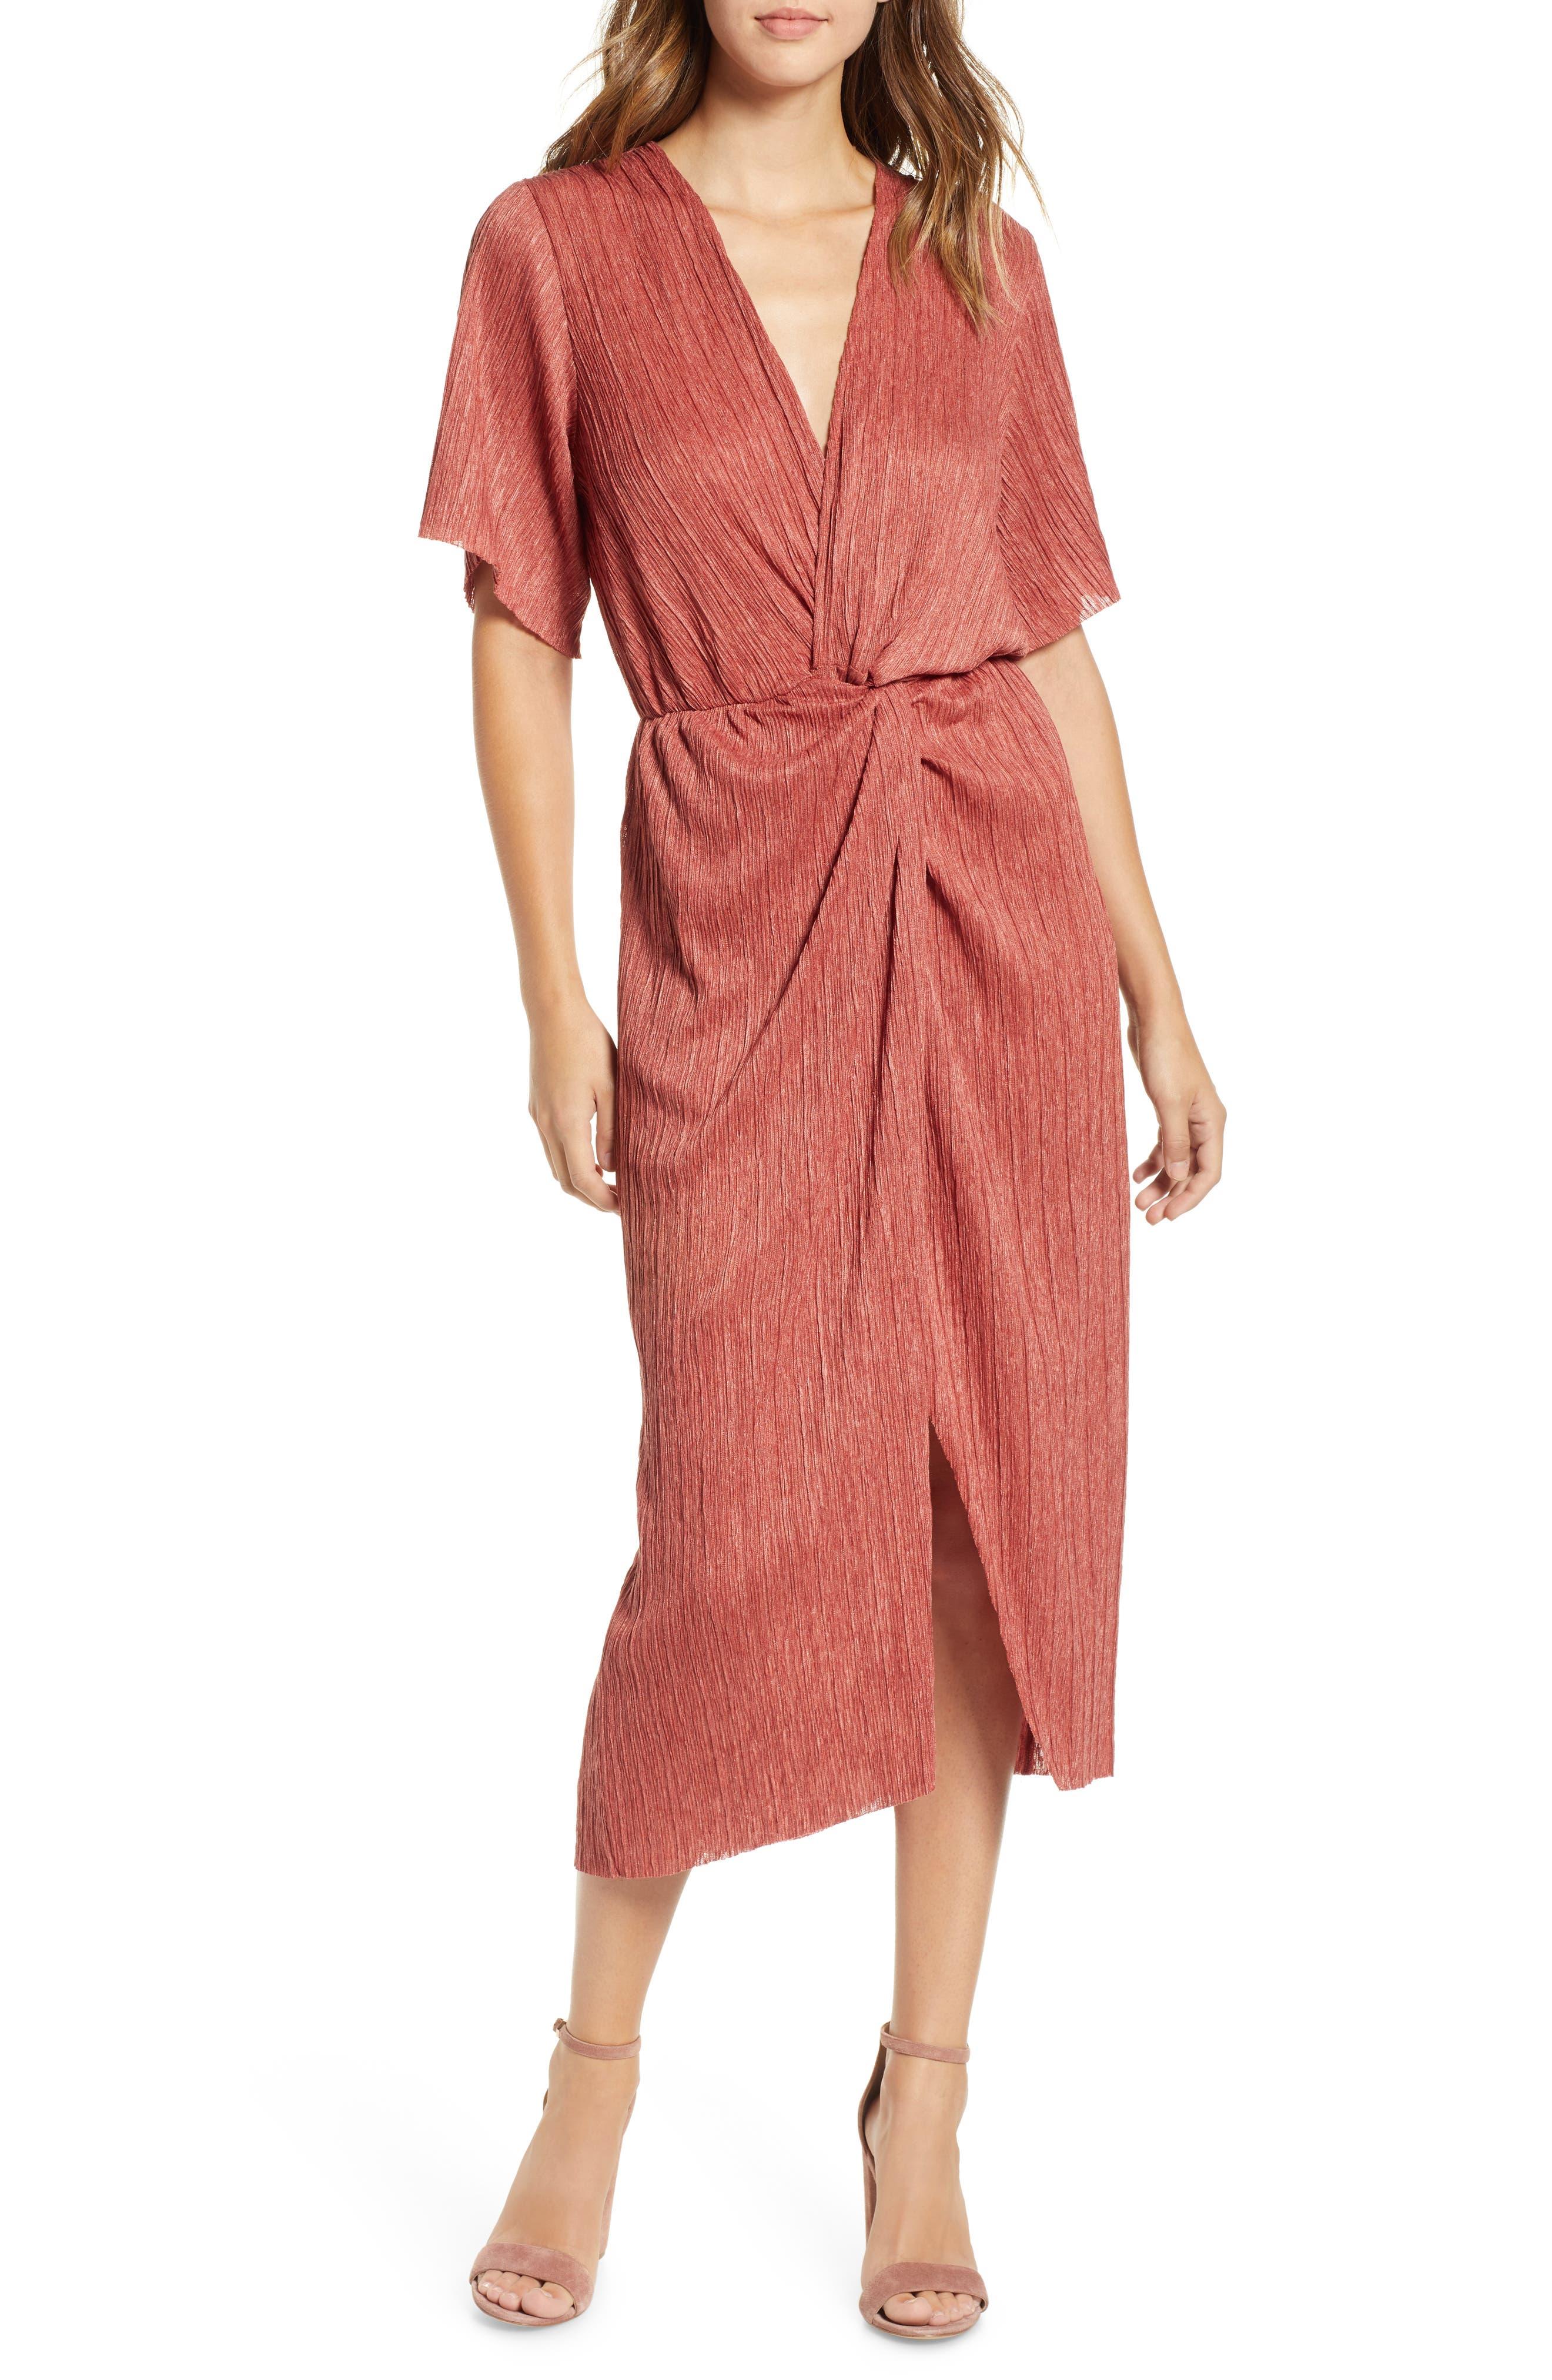 70s Dresses – Disco Dresses, Hippie Dresses, Wrap Dresses Womens All In Favor Dolman Plisse Midi Dress Size Large - Brown $59.00 AT vintagedancer.com